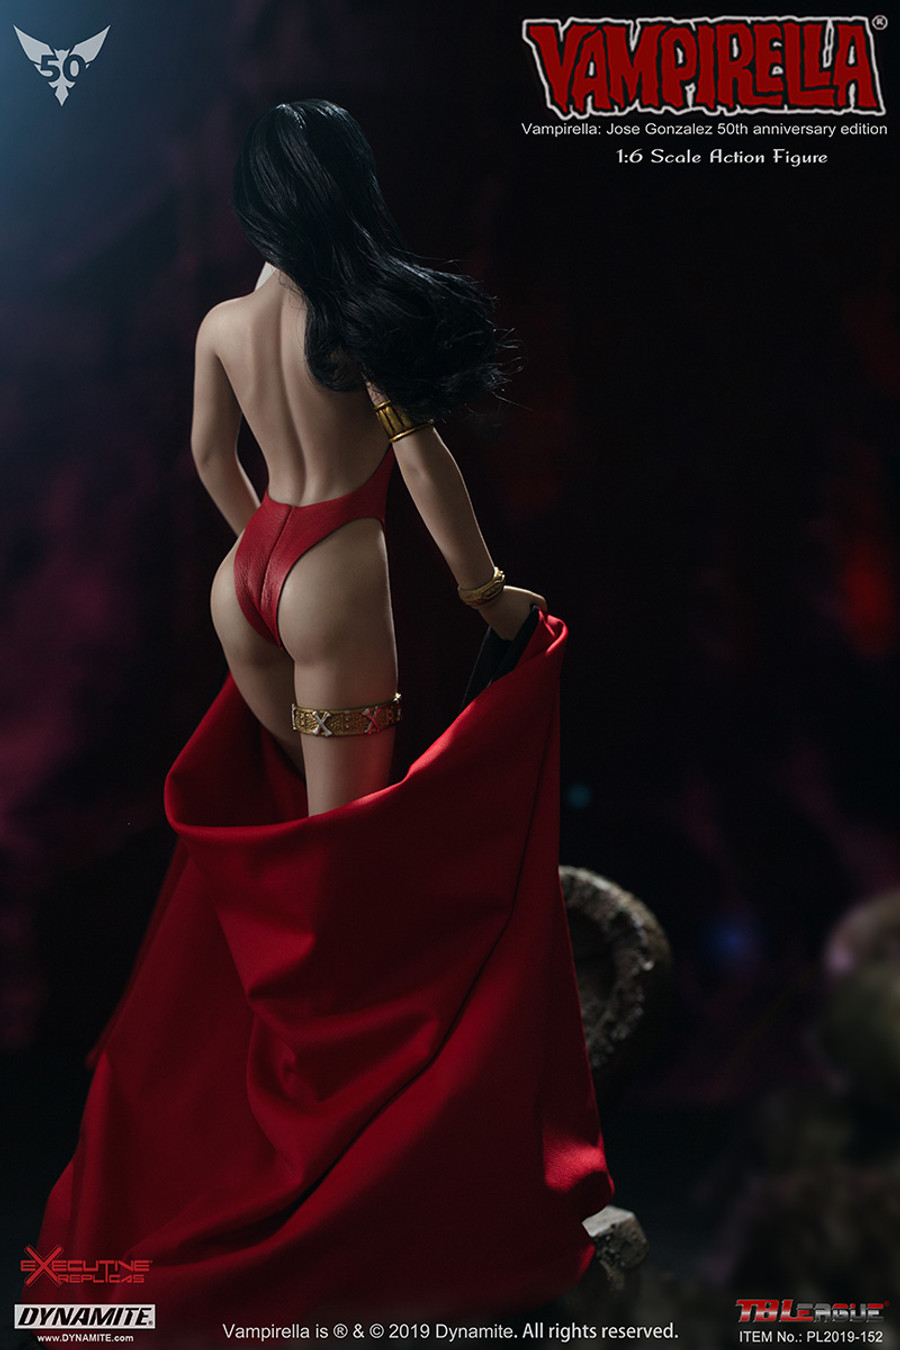 TBLeague - Vampirella - Jose Gonzalez Anniversary Edition